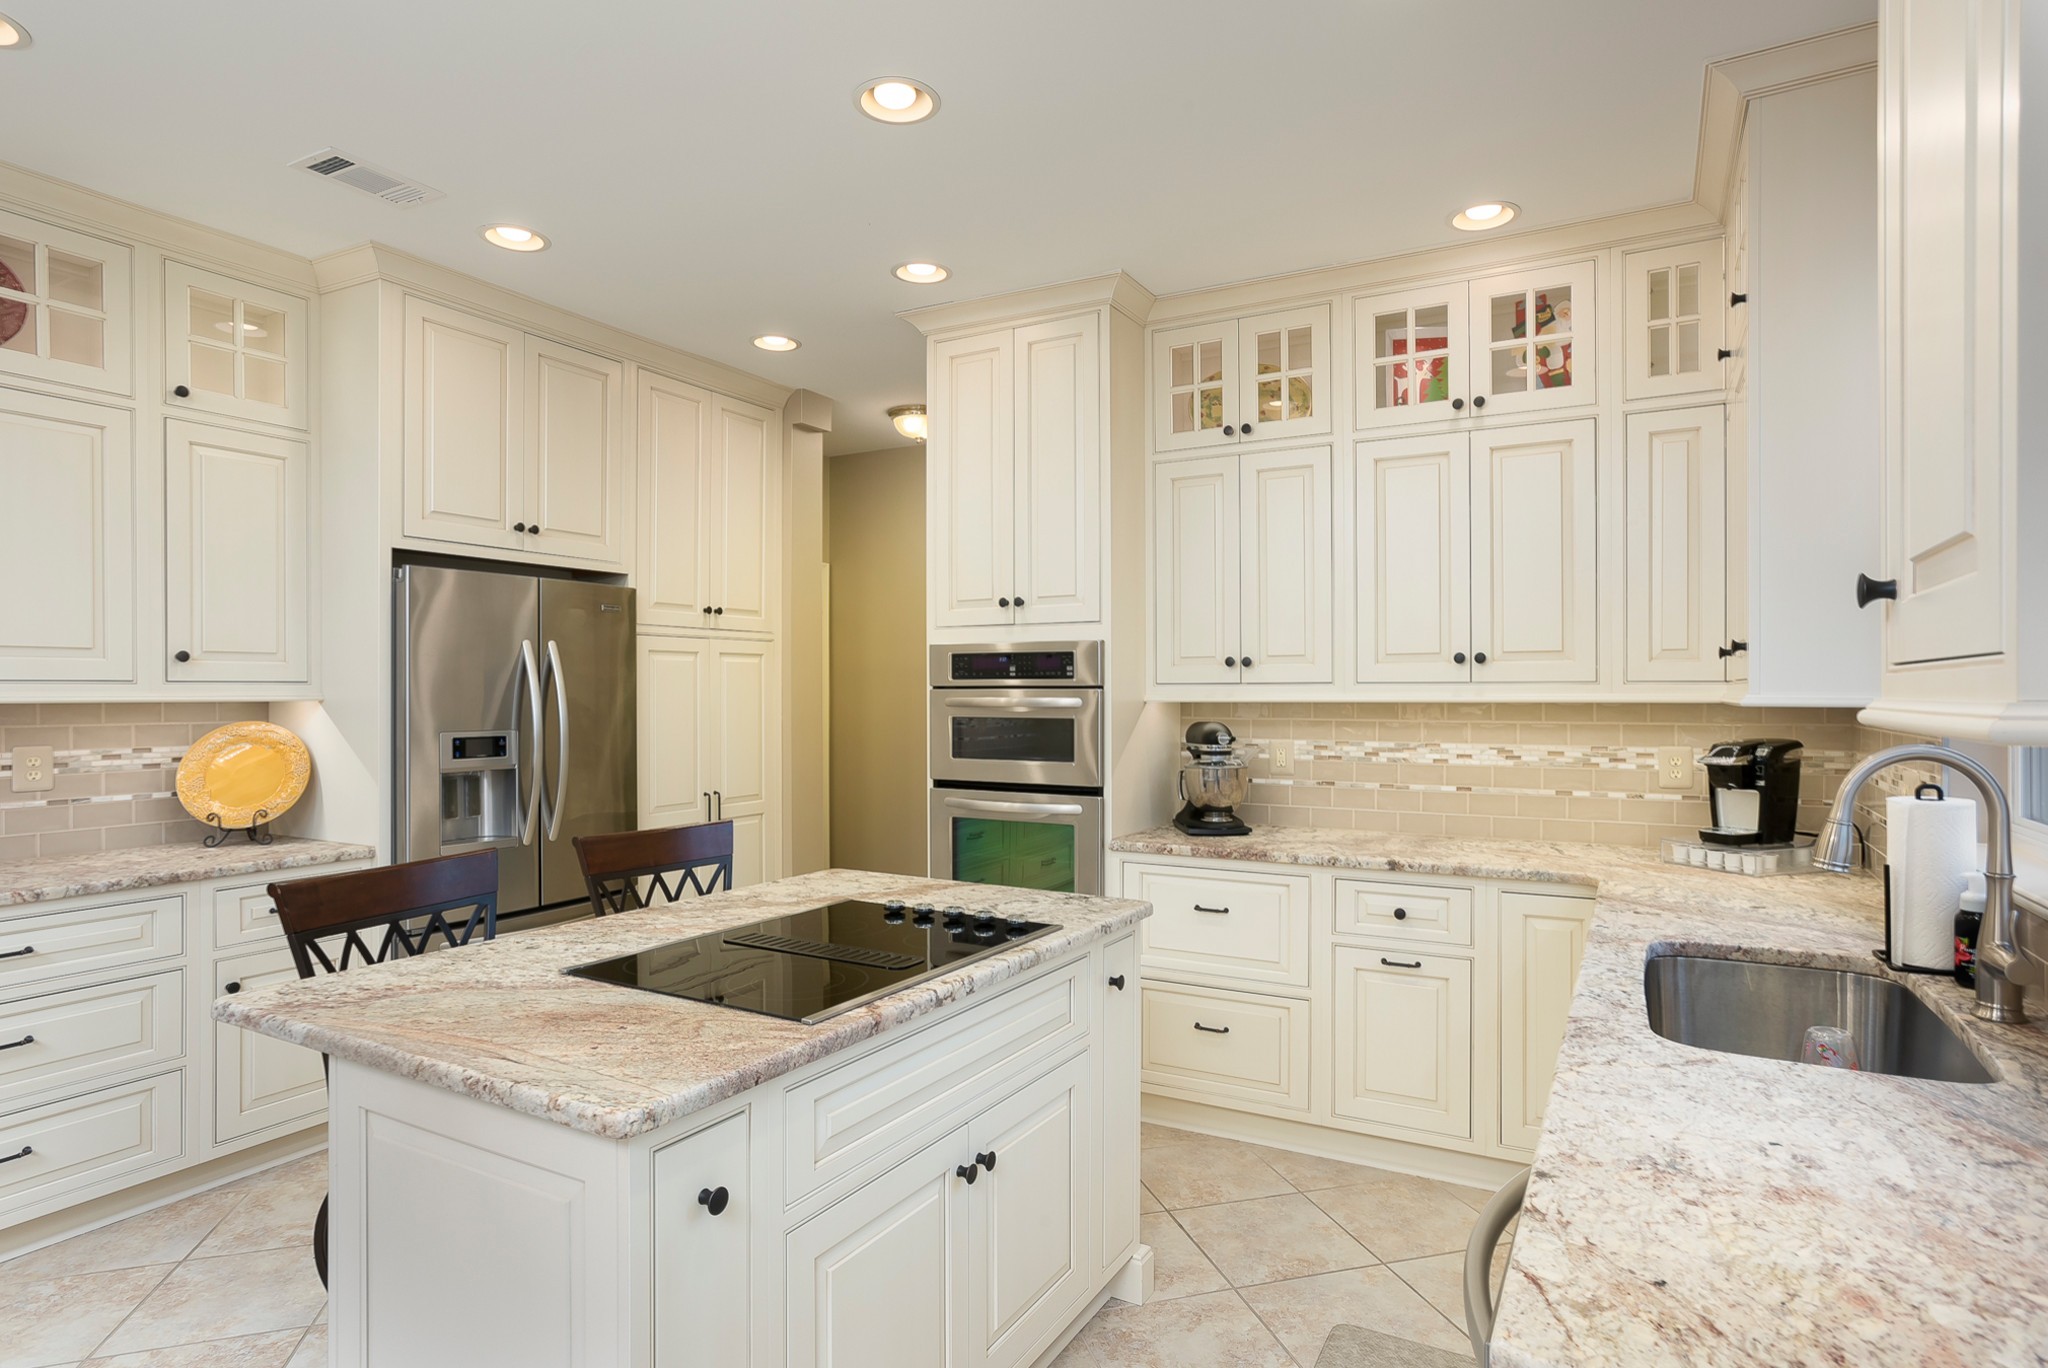 Christa Lane Kitchen Remodel